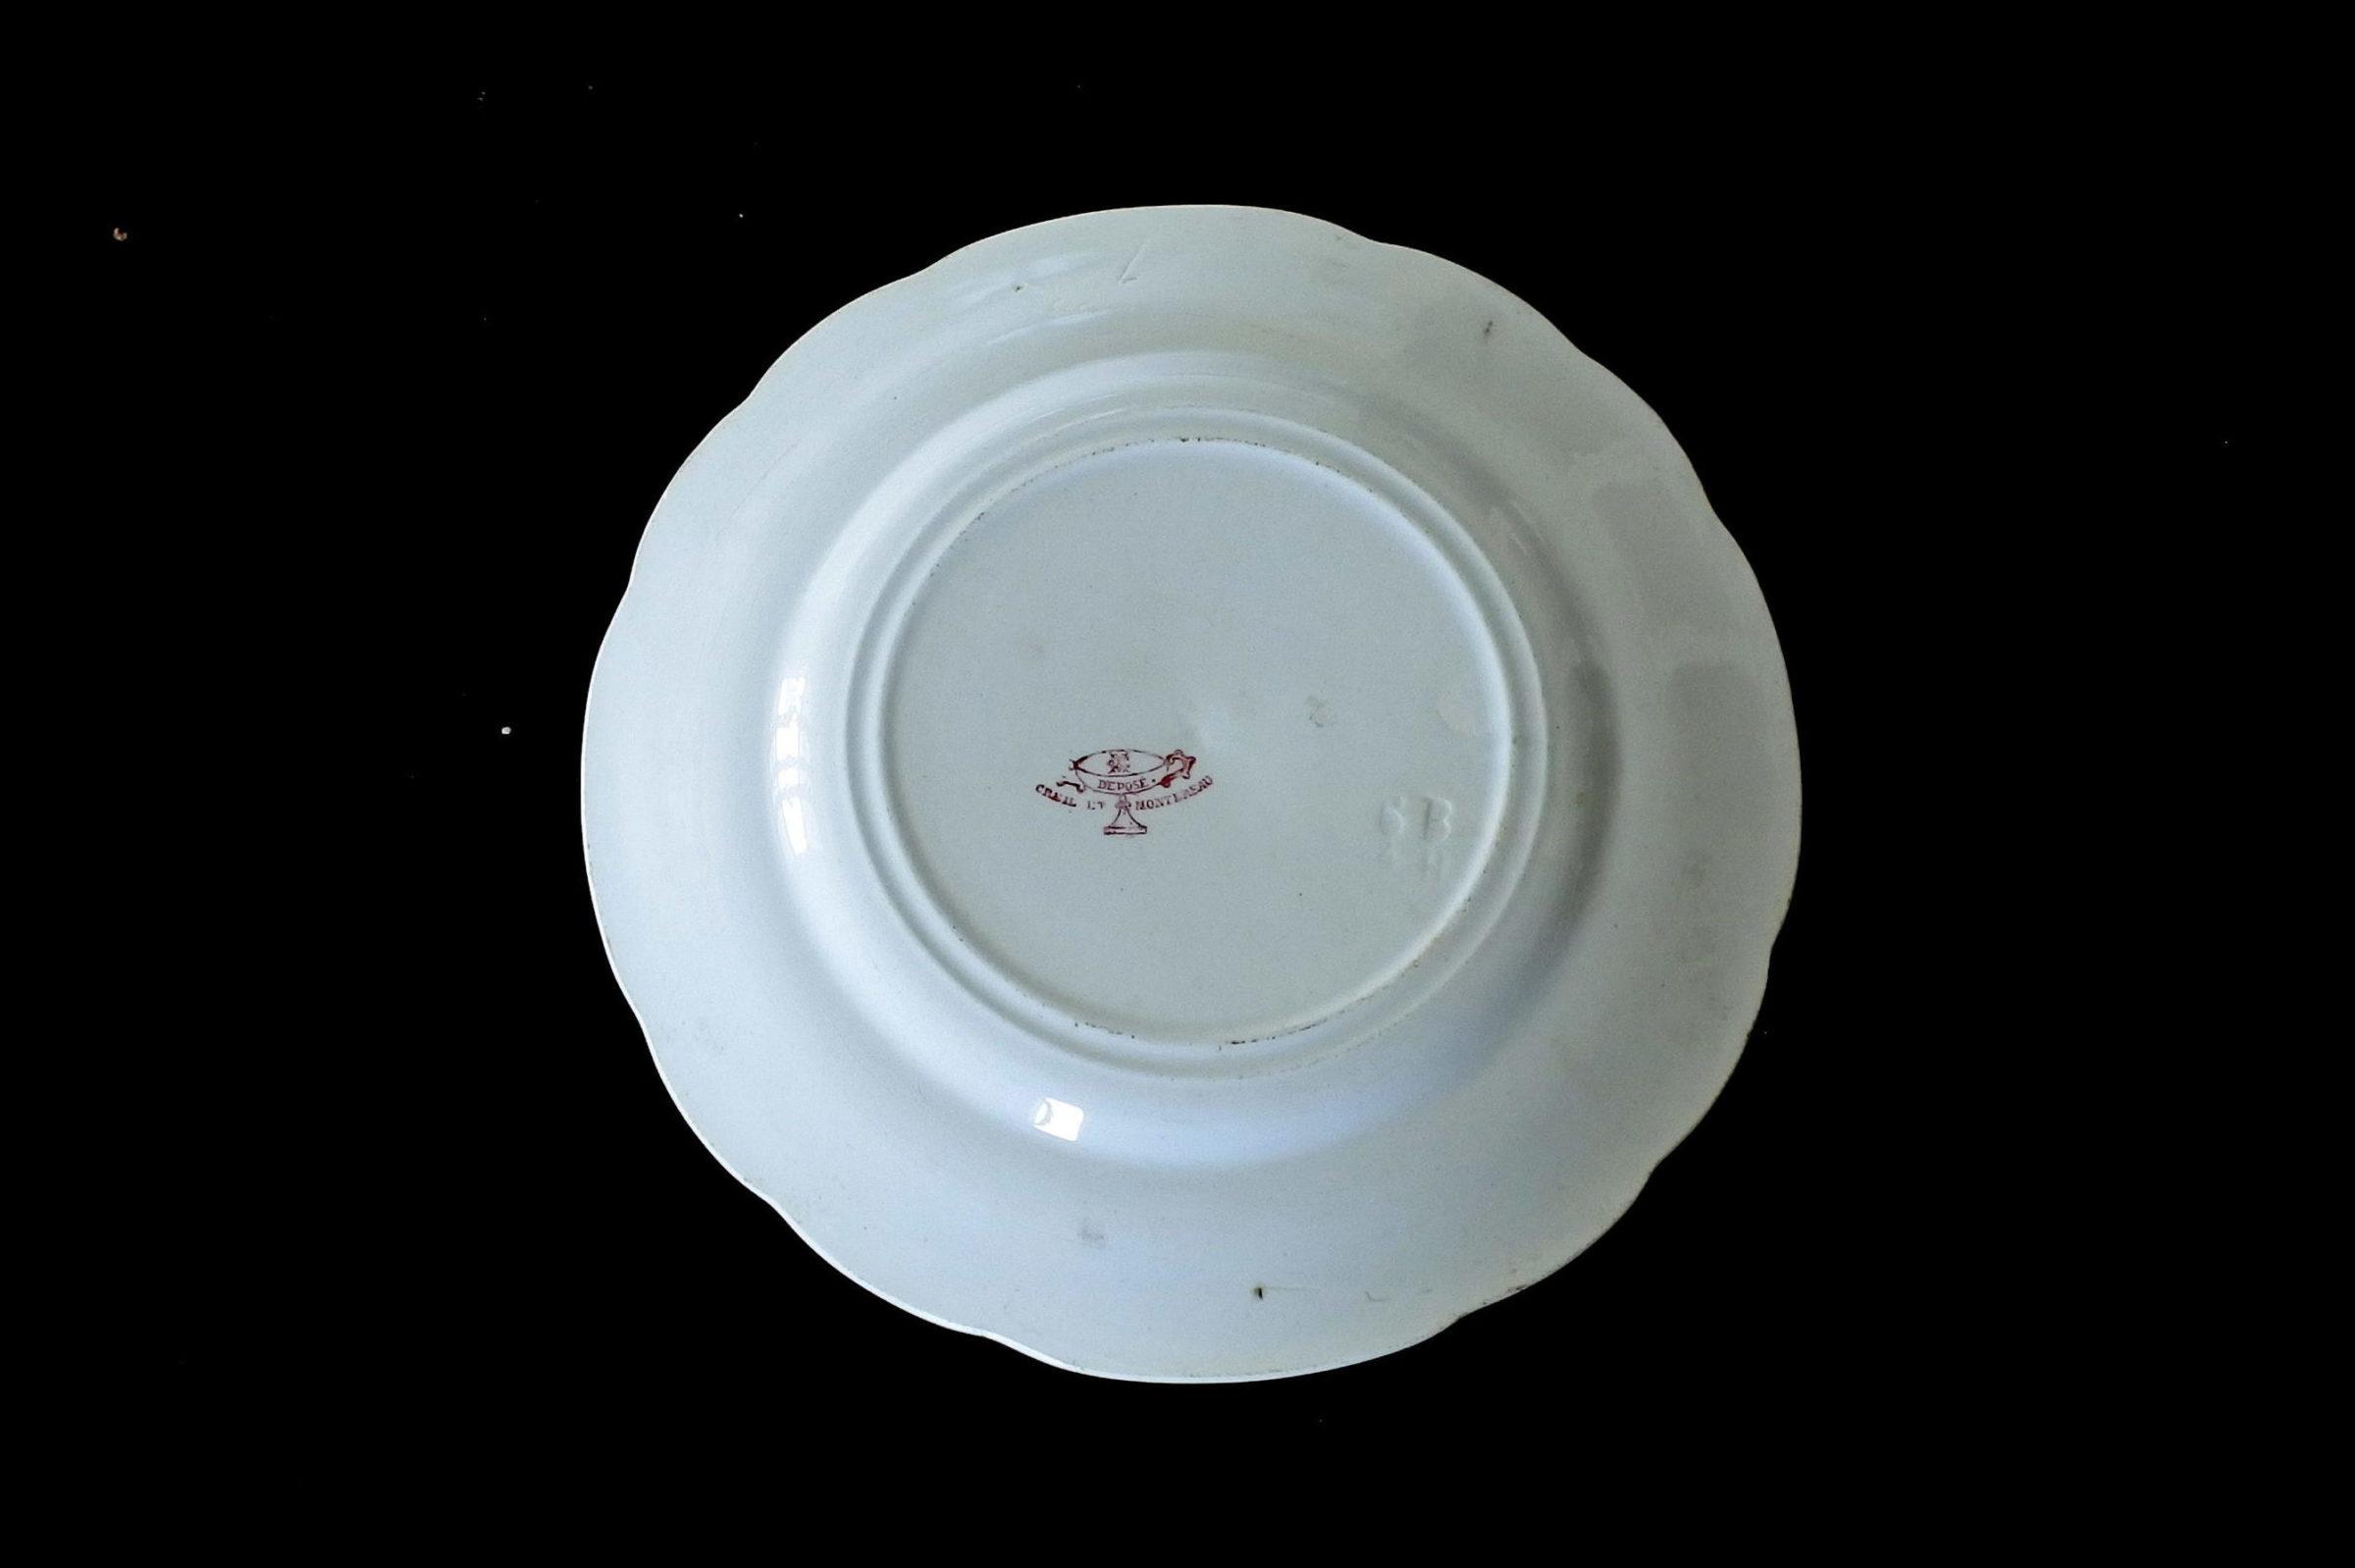 Serie completa di 12 piatti in ceramica dedicati alla vita di Bernadette - 14